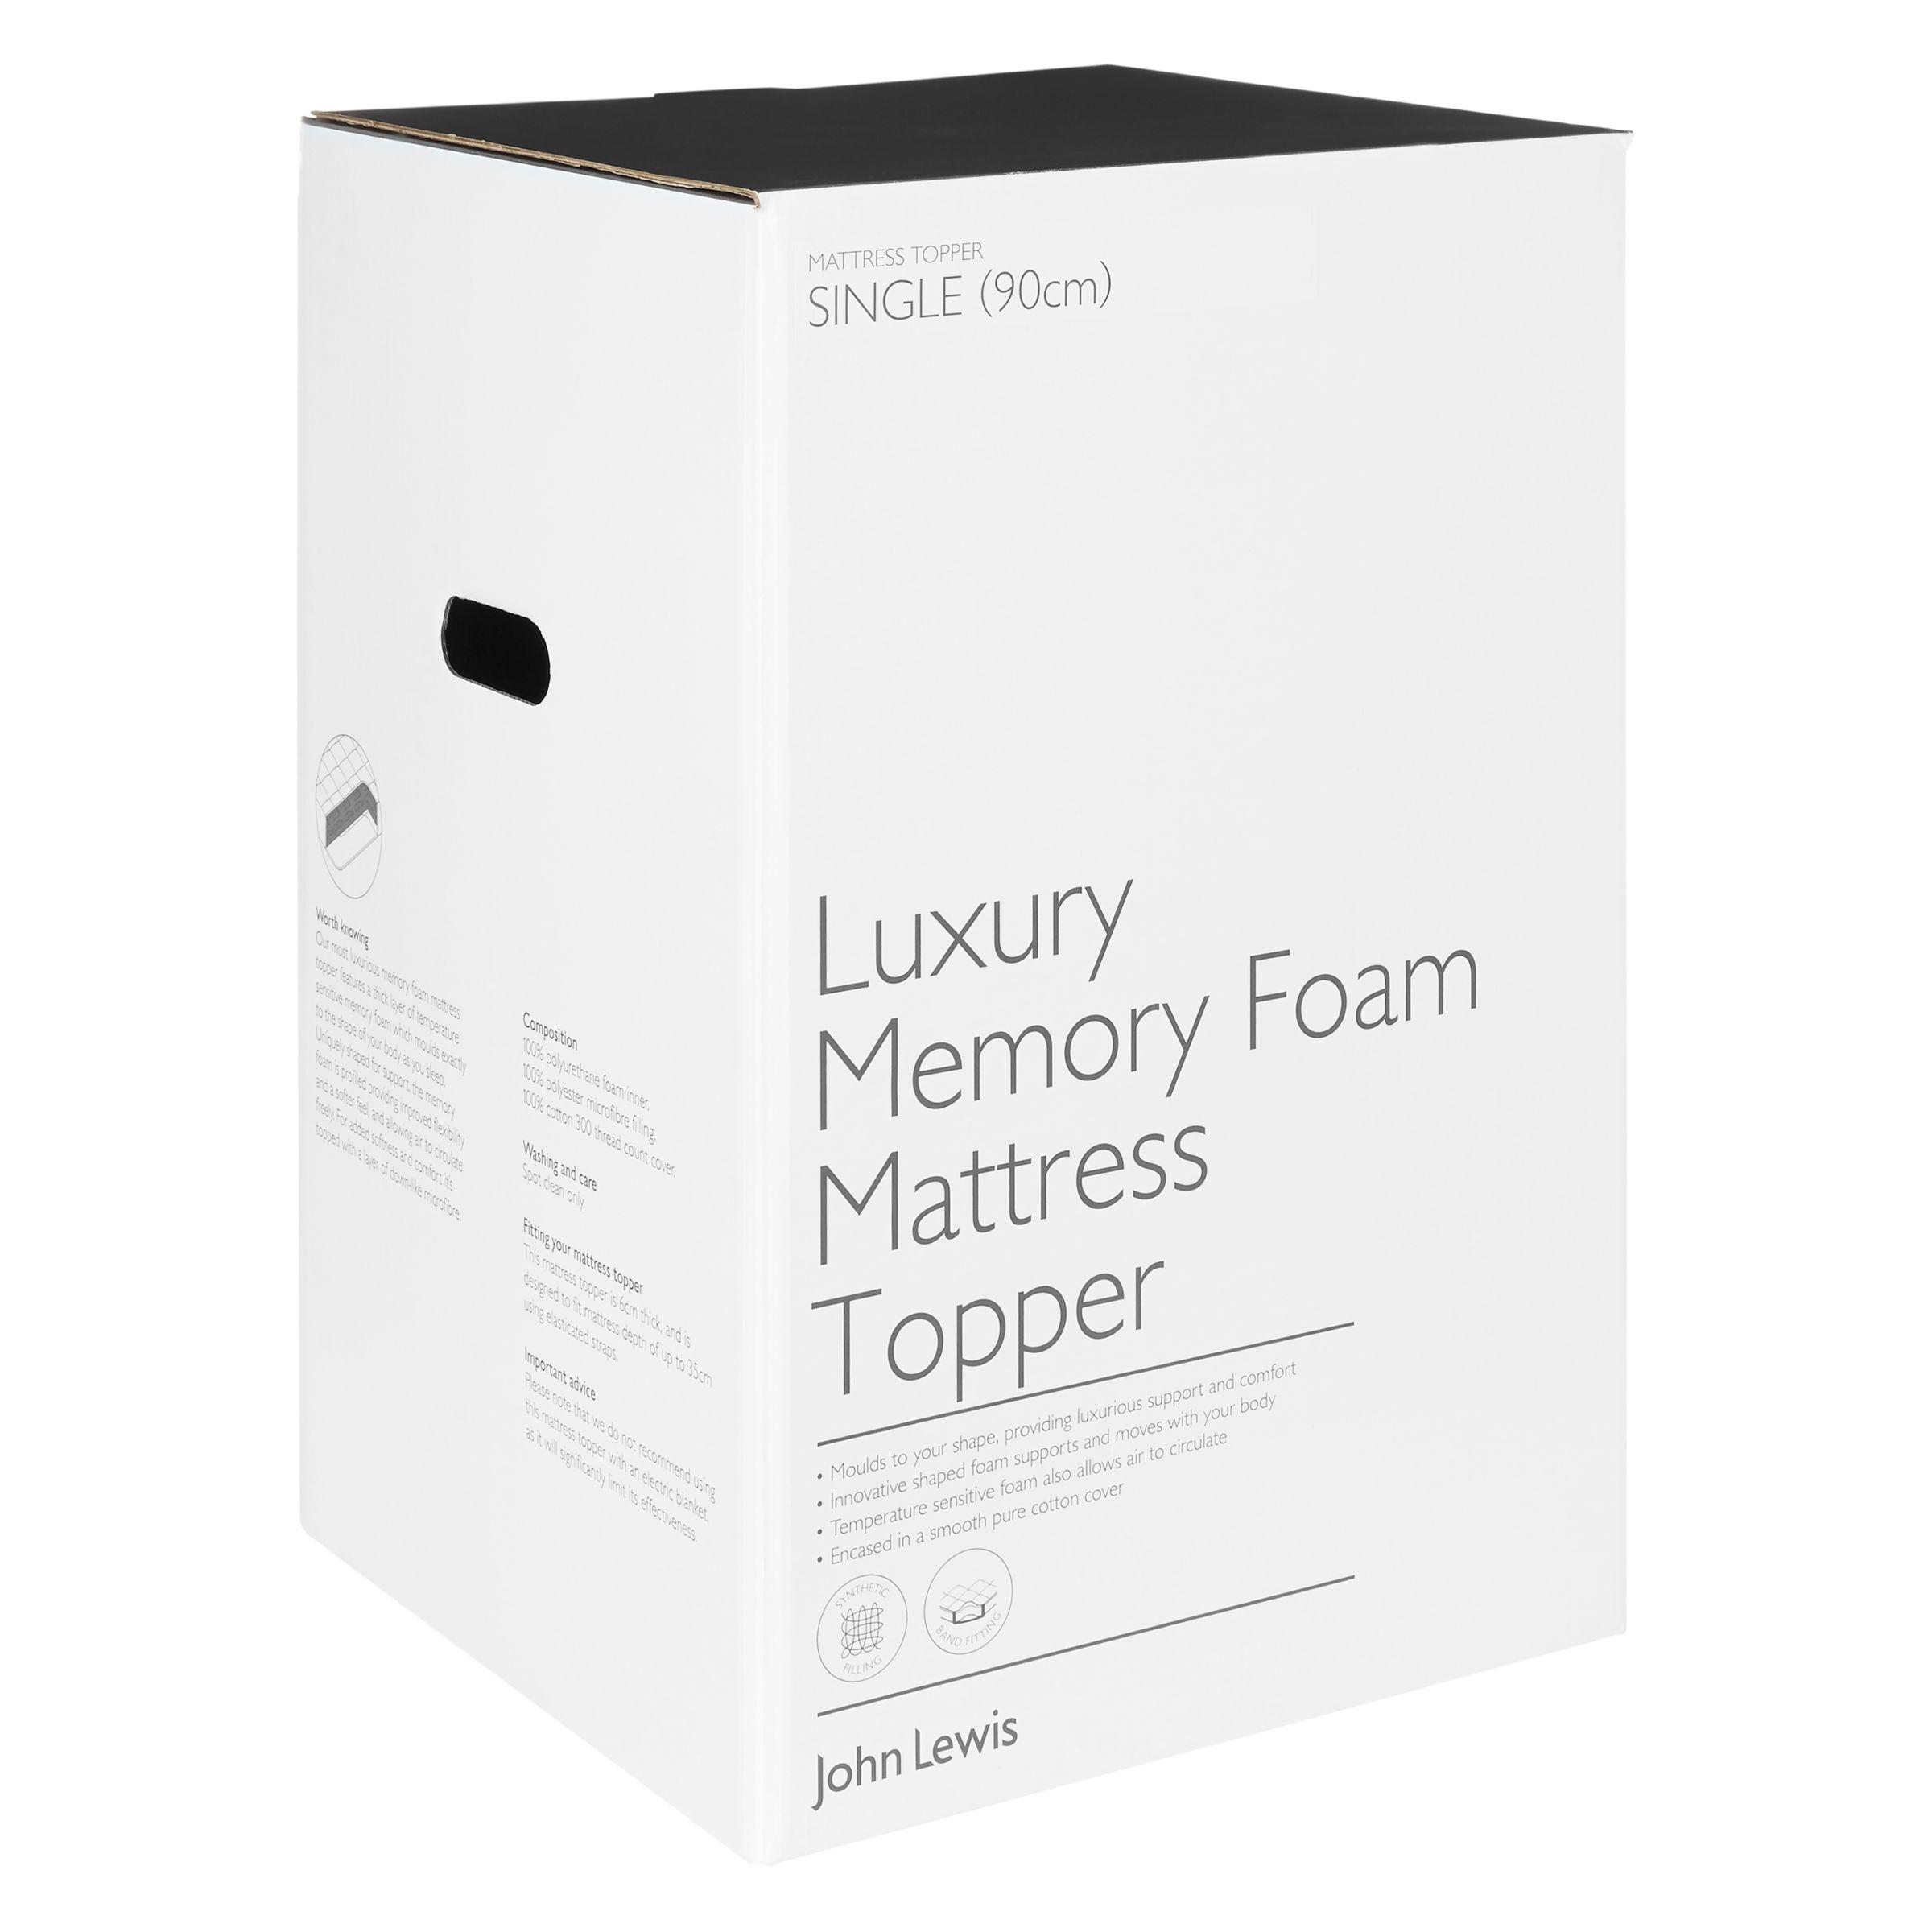 luxury memory foam mattress topper with microfibre john lewis Pillow Storage Bags buyjohn lewis partners luxury memory foam with microfibre mattress topper bed topper double online